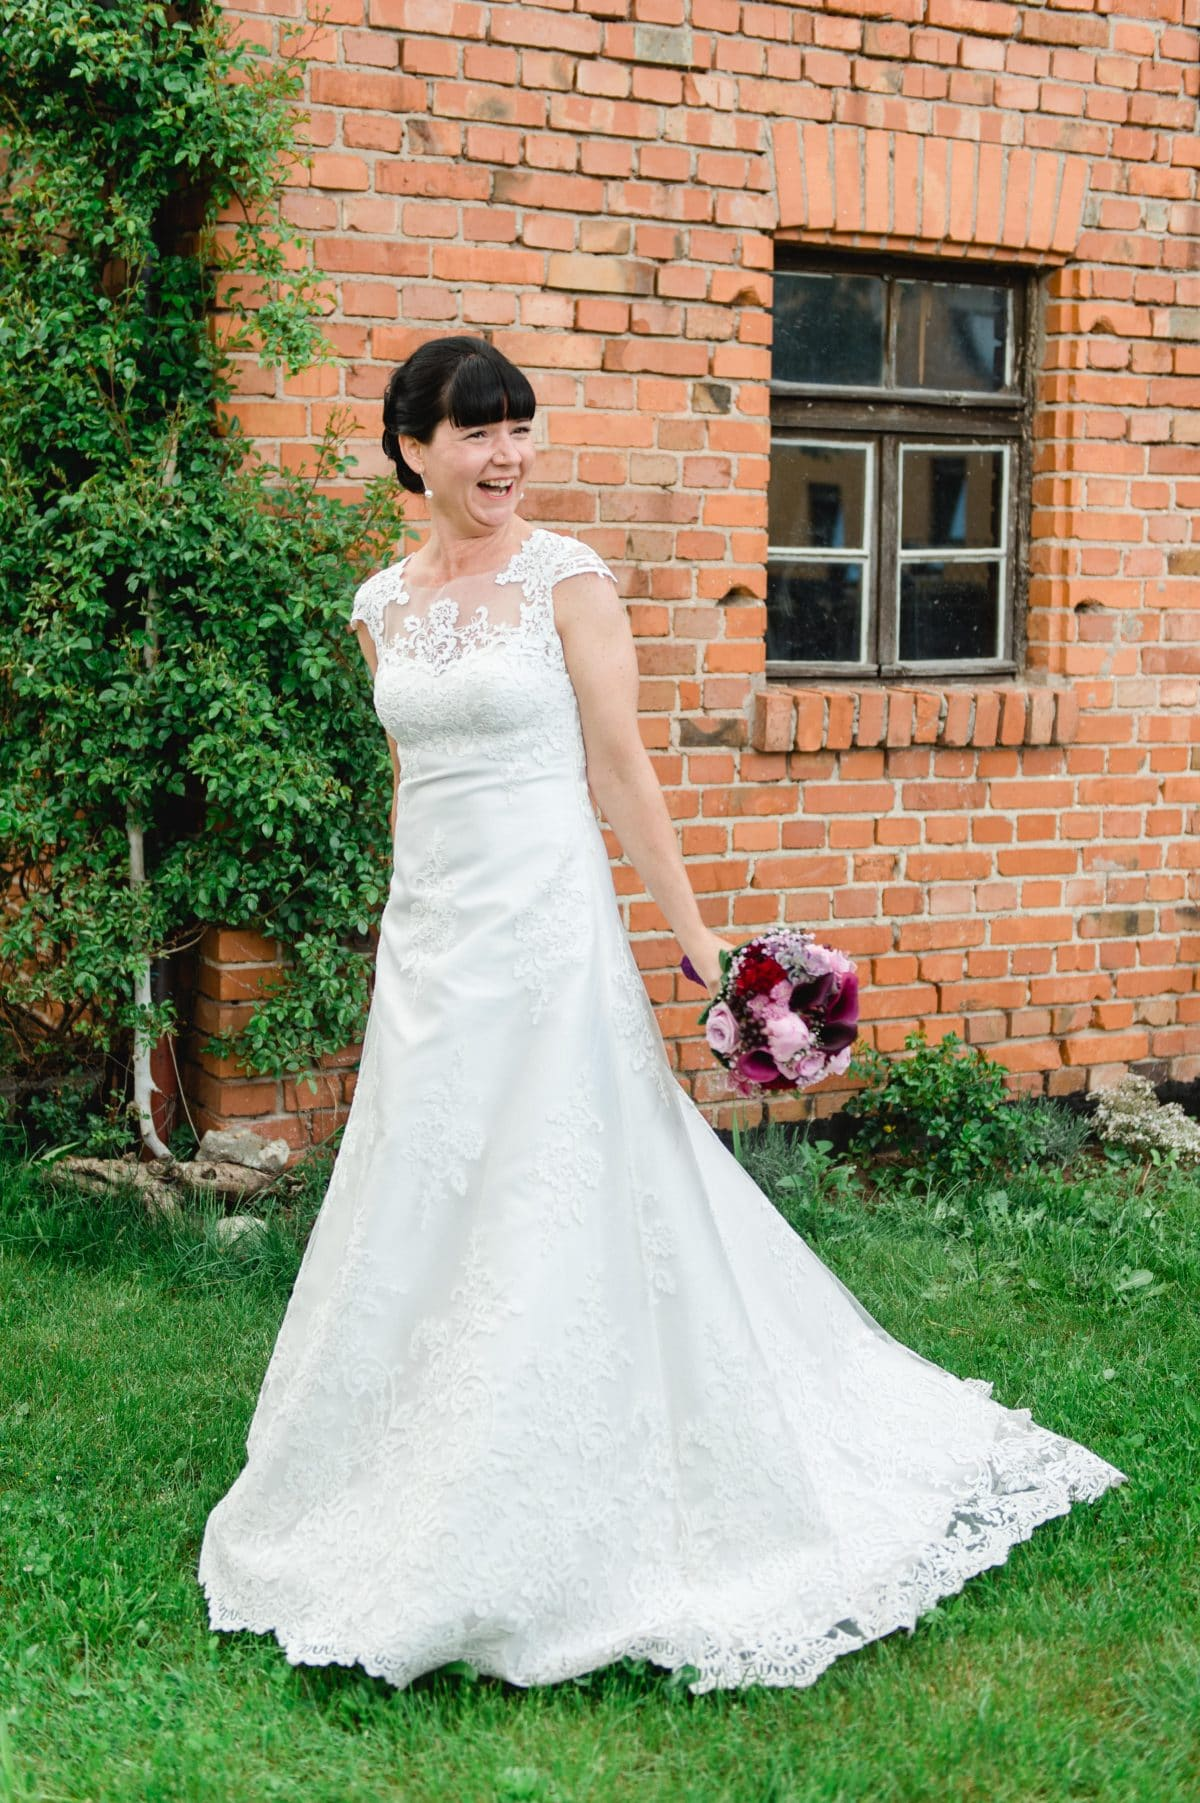 Daniela's Brautkleid nach Maß